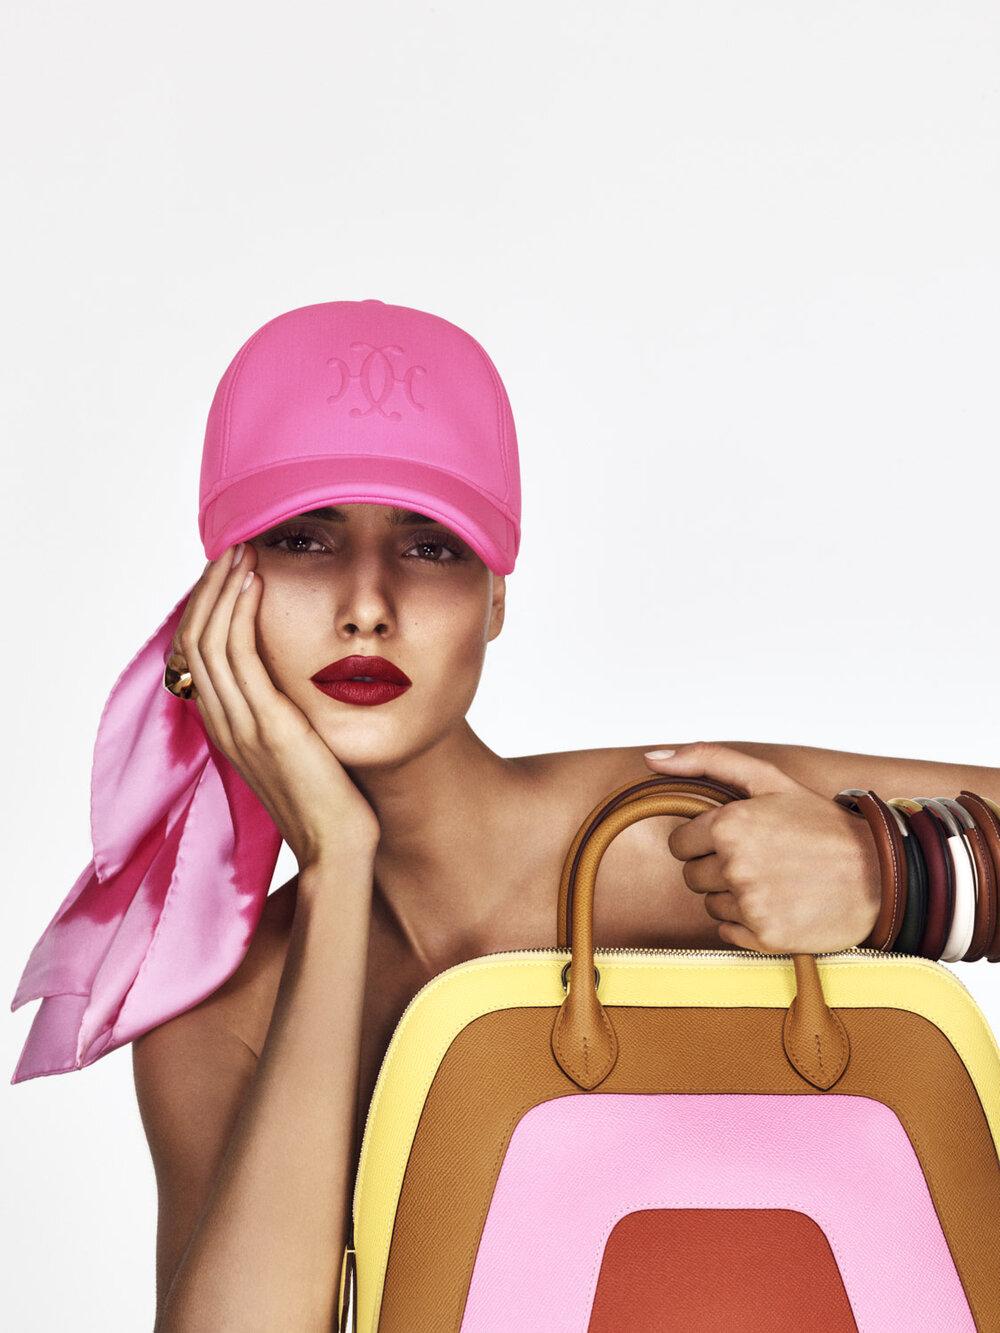 Blanca Padilla by Yulia Gorbachenko for Harper's Bazaar US February 2020